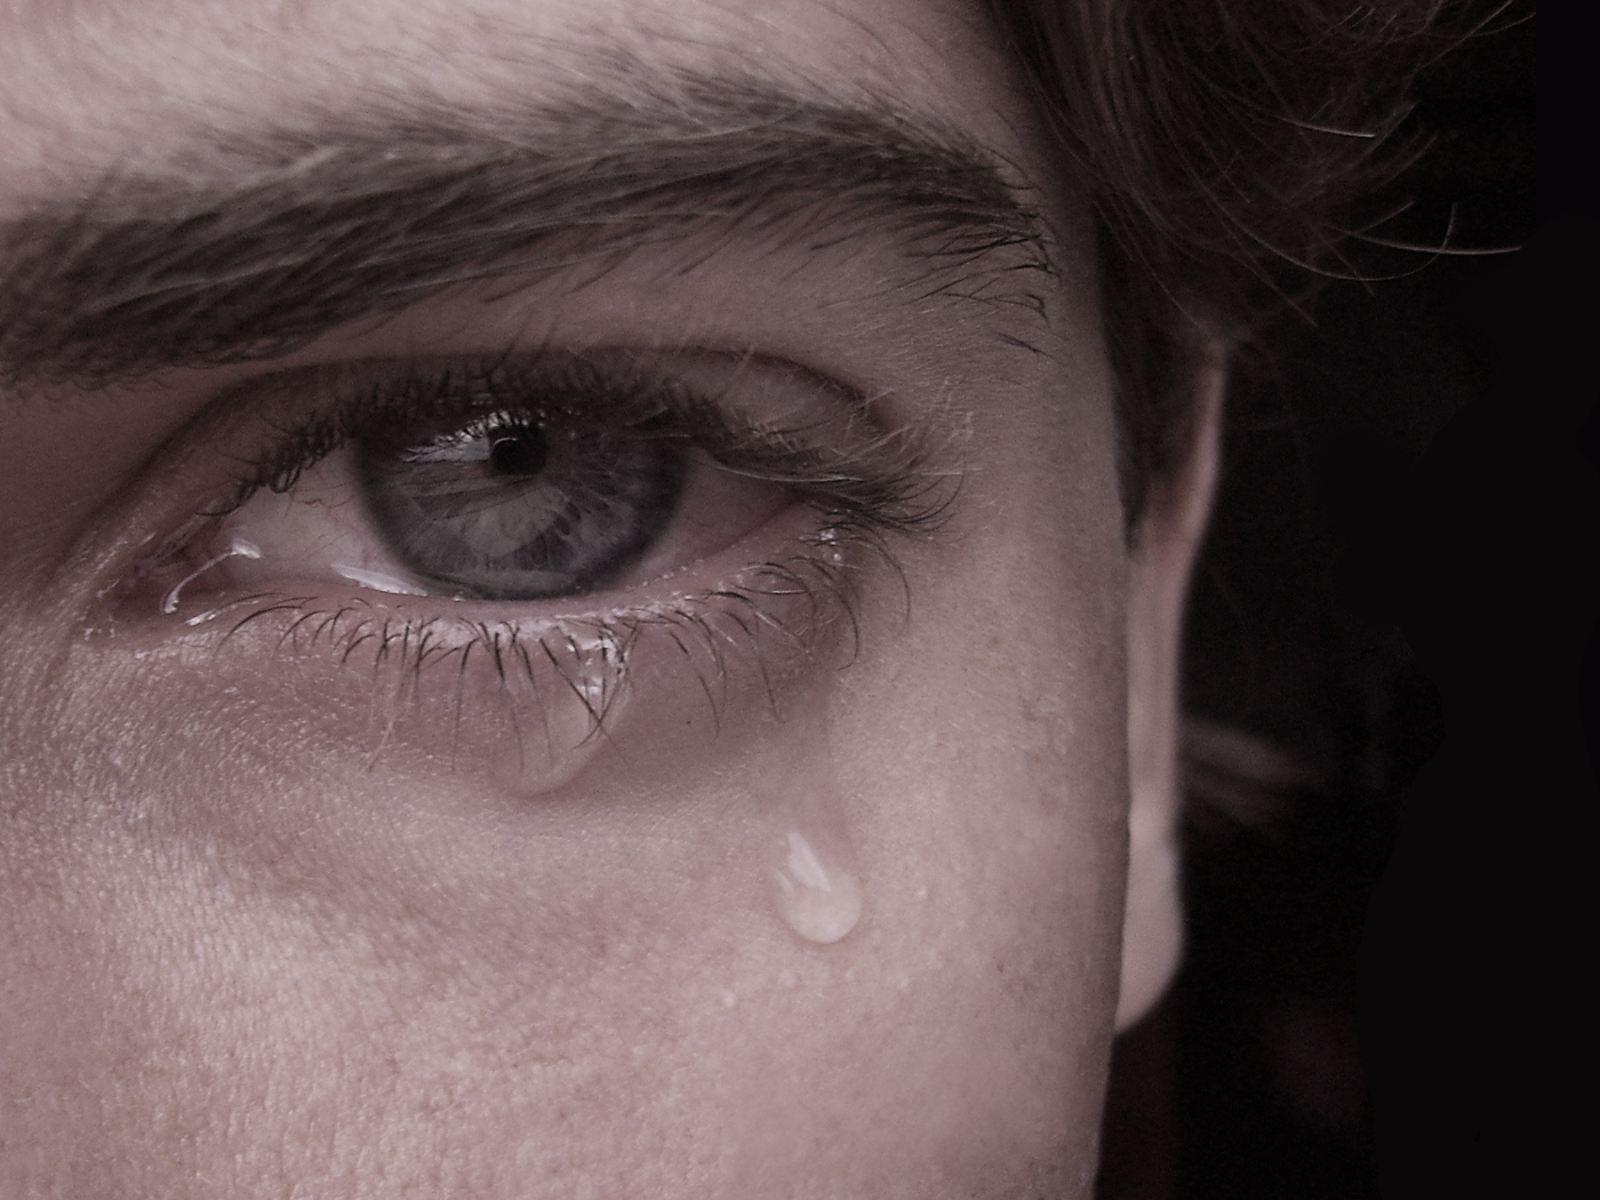 Photo of التوتر+قلة النوم + الحزن = ارتفاع معدل السكتة قلبية 21 ضعفا